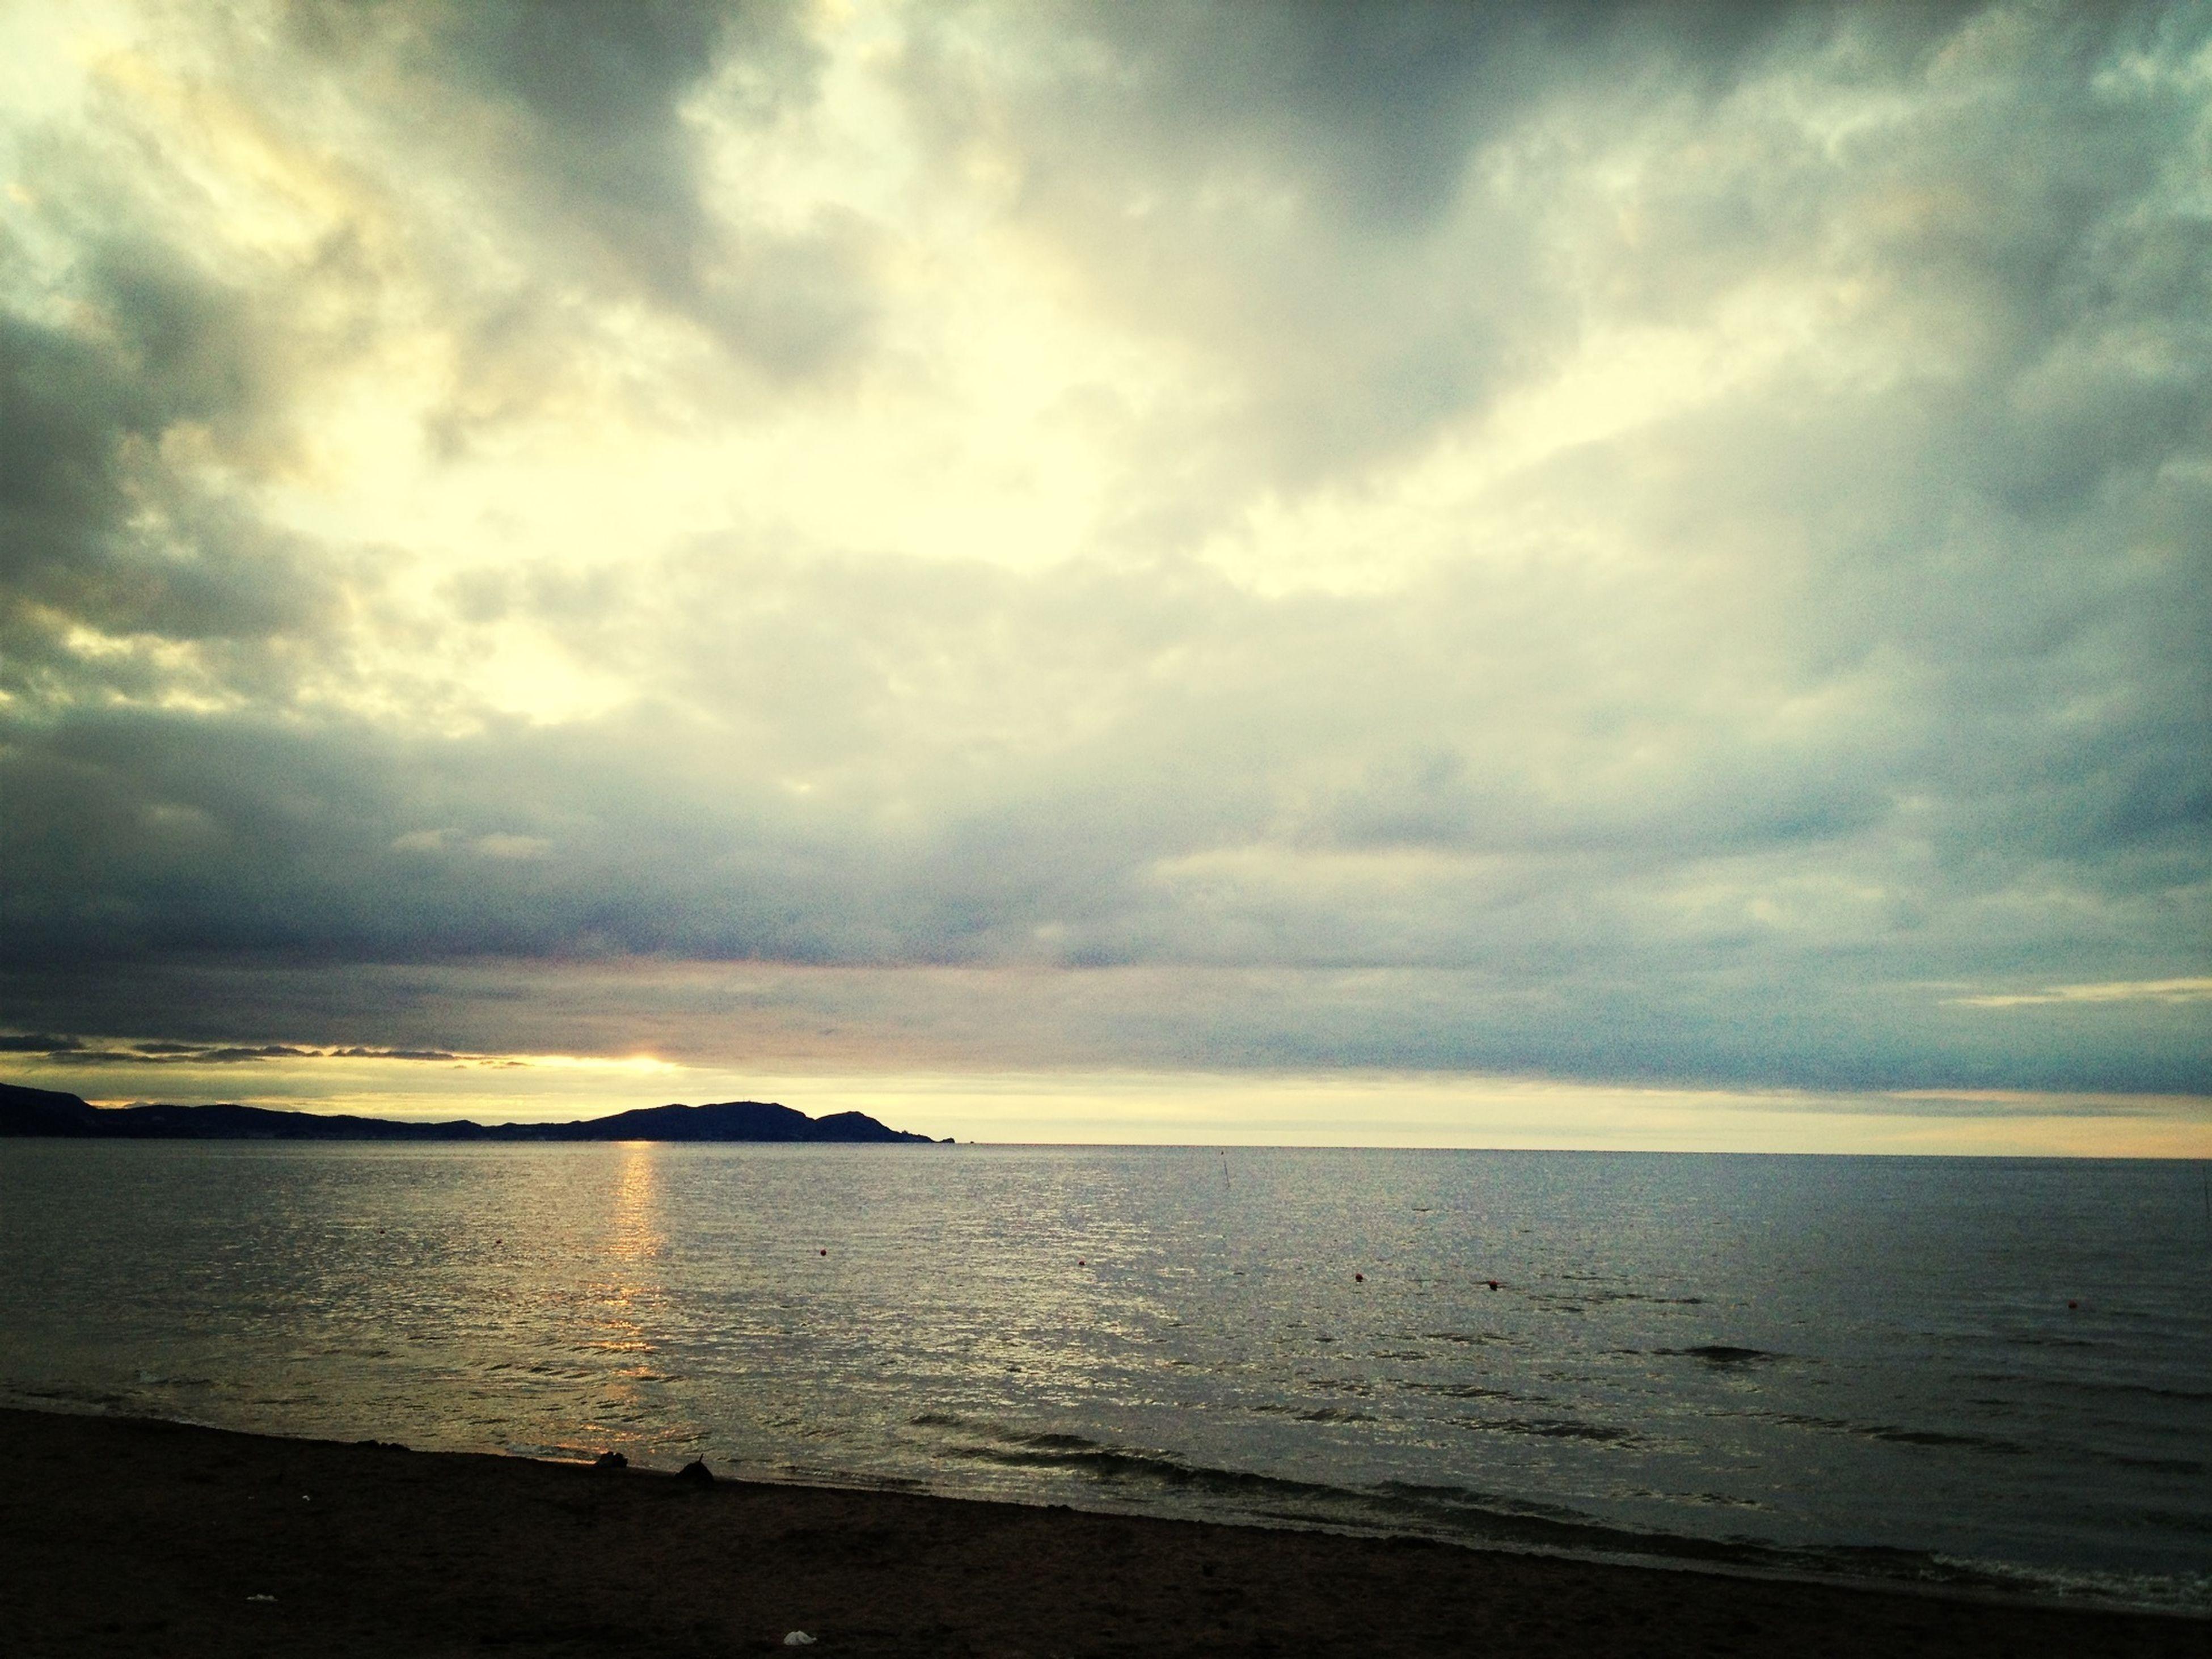 sea, horizon over water, water, sky, tranquil scene, scenics, beach, tranquility, beauty in nature, cloud - sky, shore, nature, cloudy, idyllic, cloud, sunset, seascape, calm, coastline, dusk